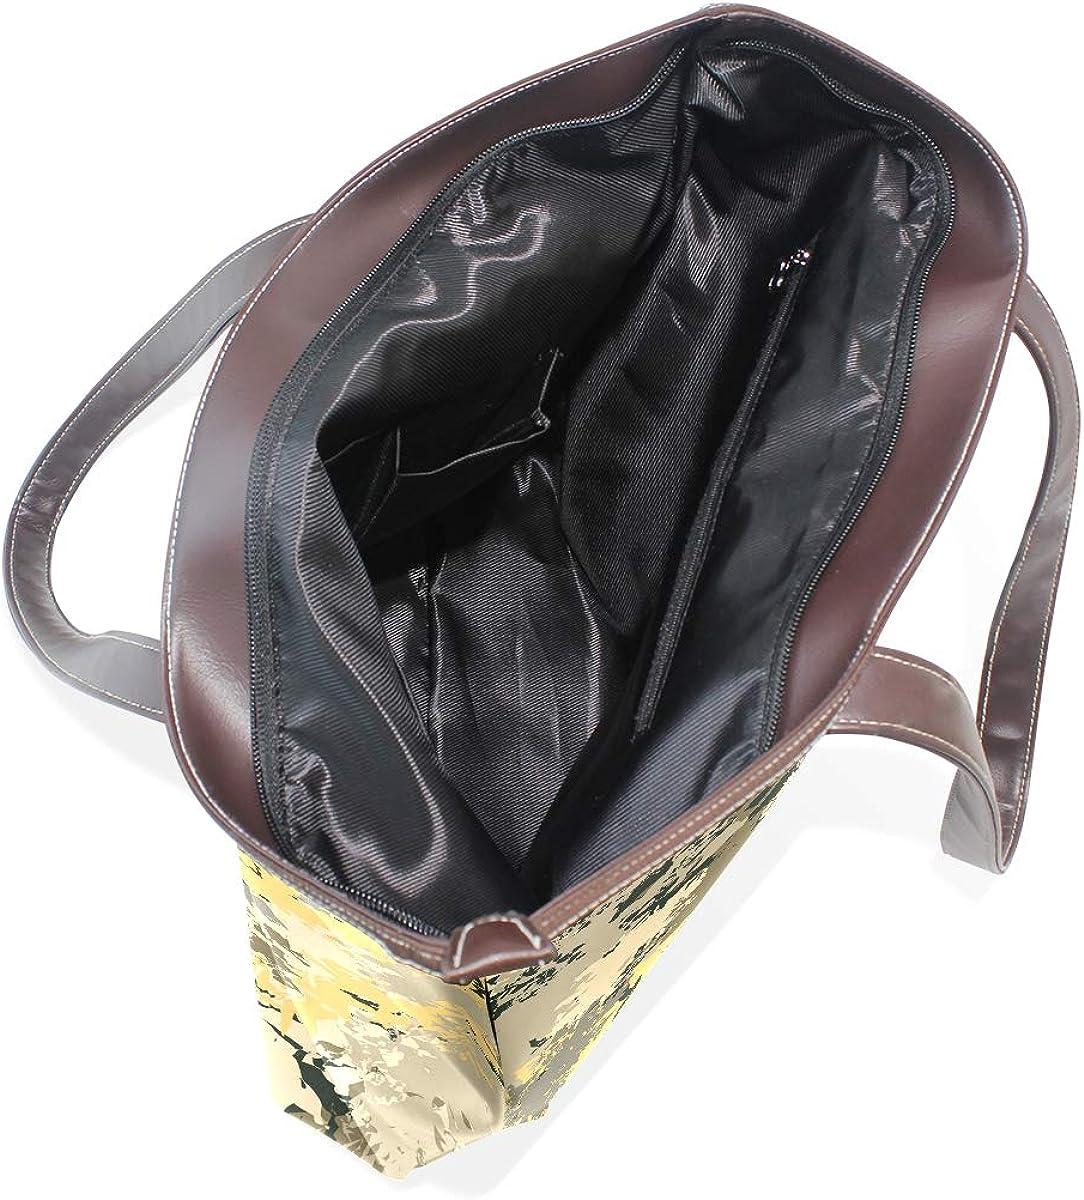 Youth Camo Design Yellow Womens Leather Handbag Shoulder Bag Satchel Handbags Leather Tote Purse Women Handle Handbags